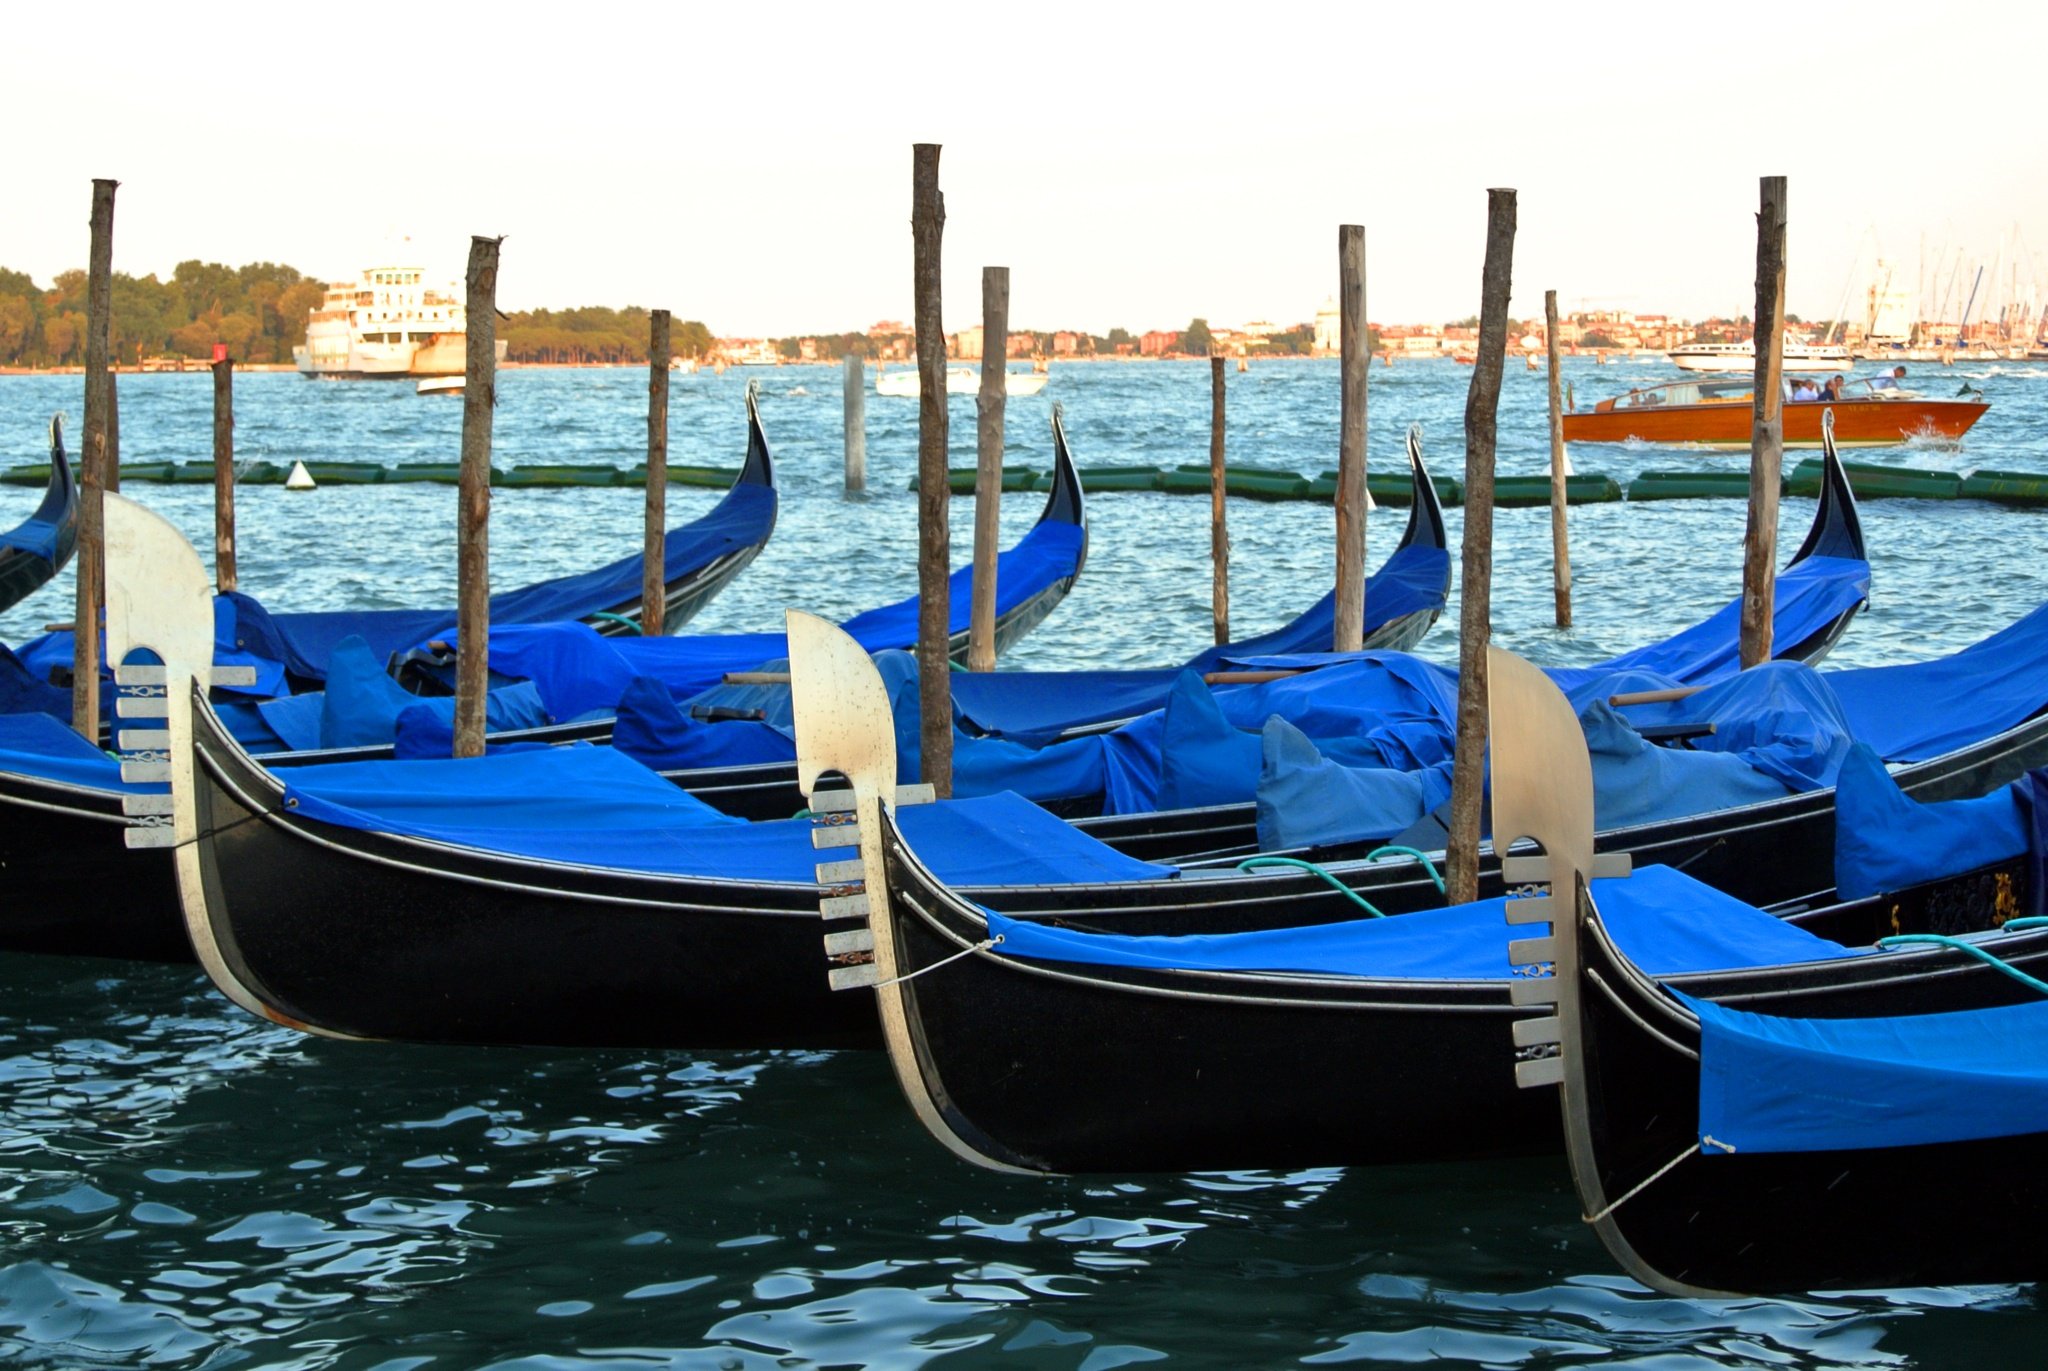 Blue Boat by Hr Lemon